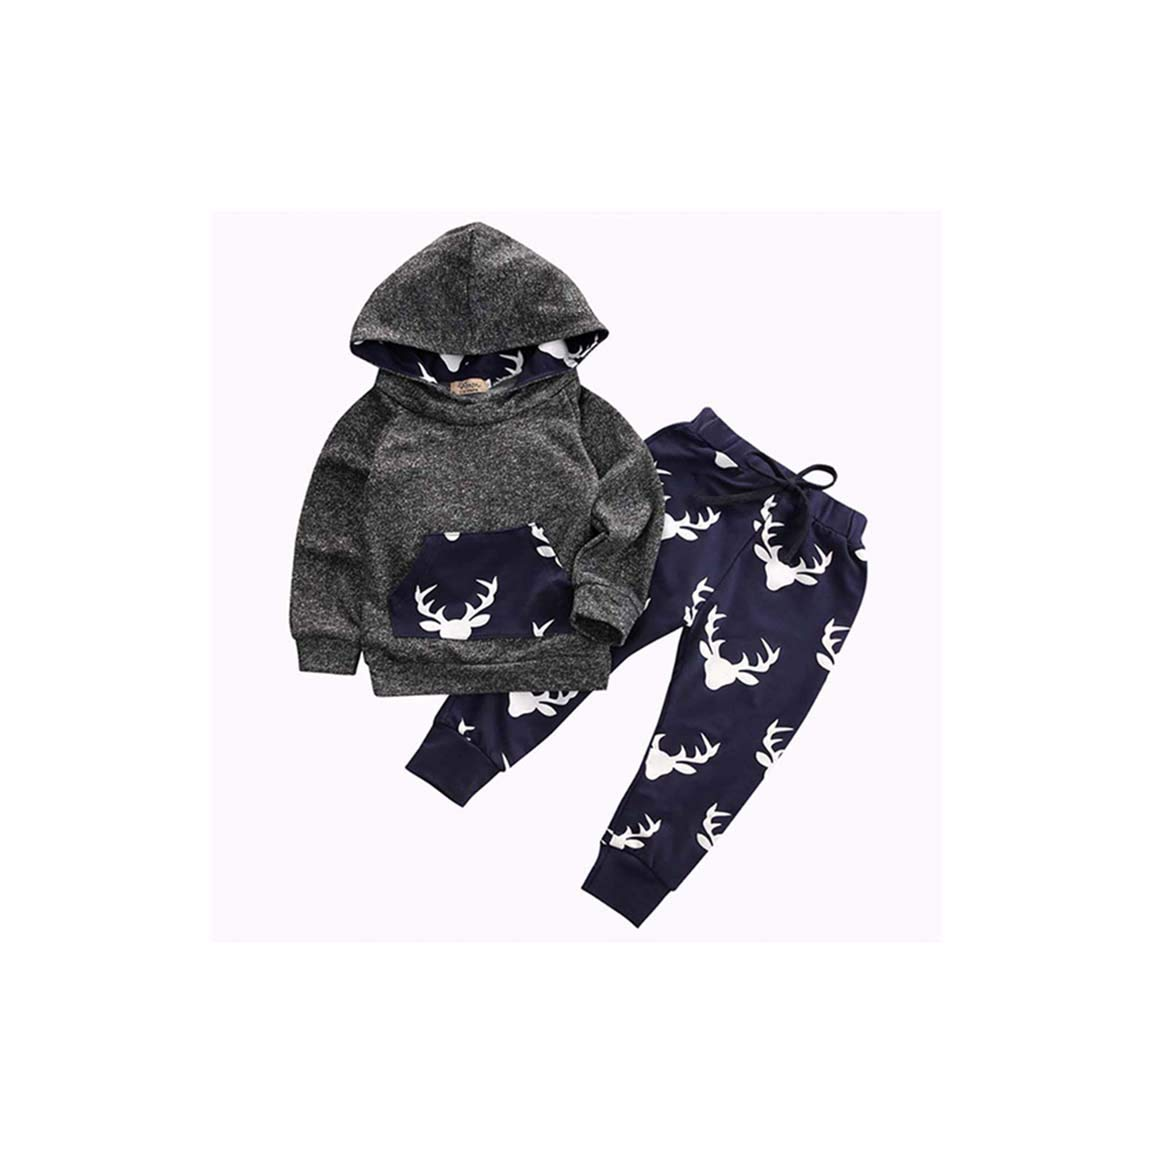 8f66d20fb Amazon.com  Baby Boys Christmas 2PCS Outfits Clothes Set Long Sleeve ...